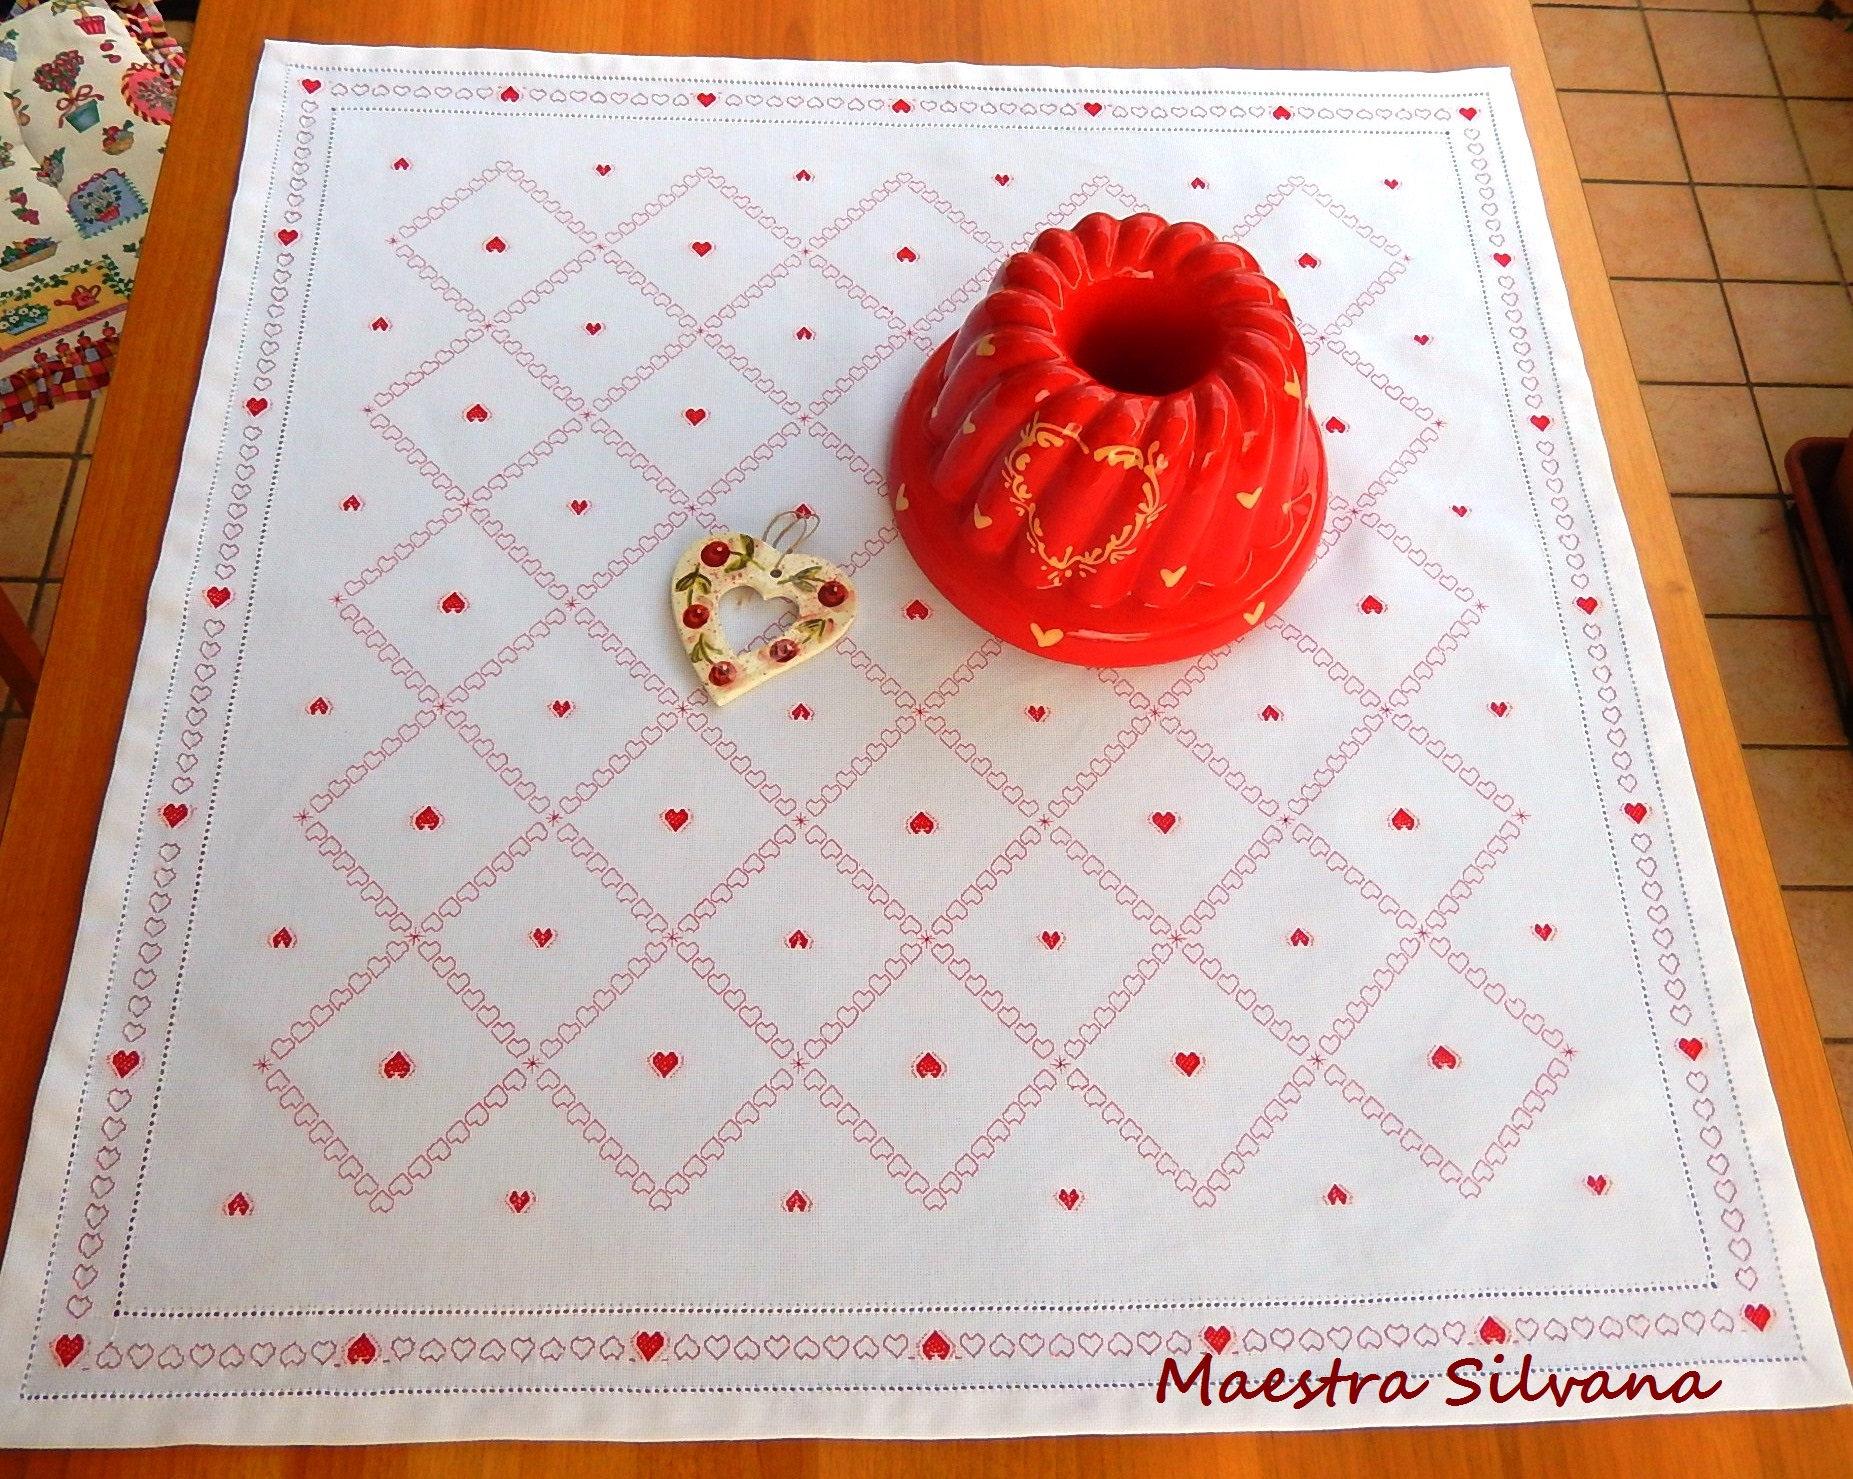 coeurs de tissu rouge rouge coeurs table set de table. Black Bedroom Furniture Sets. Home Design Ideas